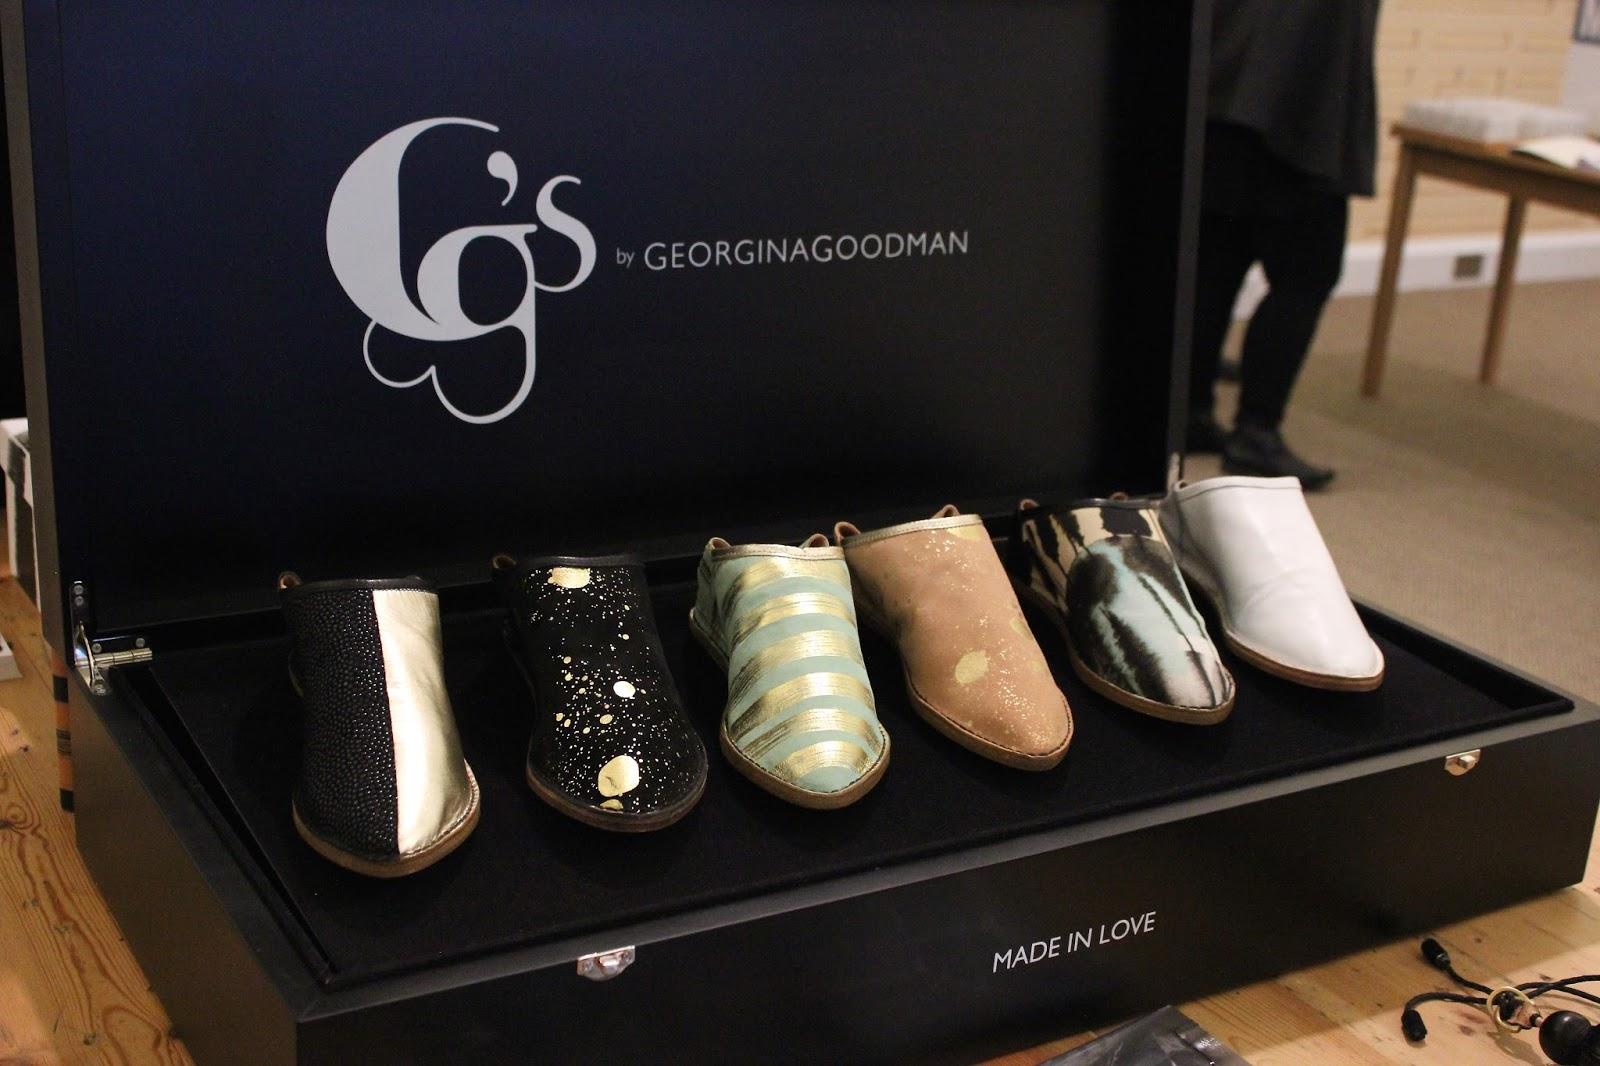 georgie minter-brown, actress, blogger, press day, ss16, spring, summer, 2016, fashion, modus publicity, gg's by georgina goodman, shoes